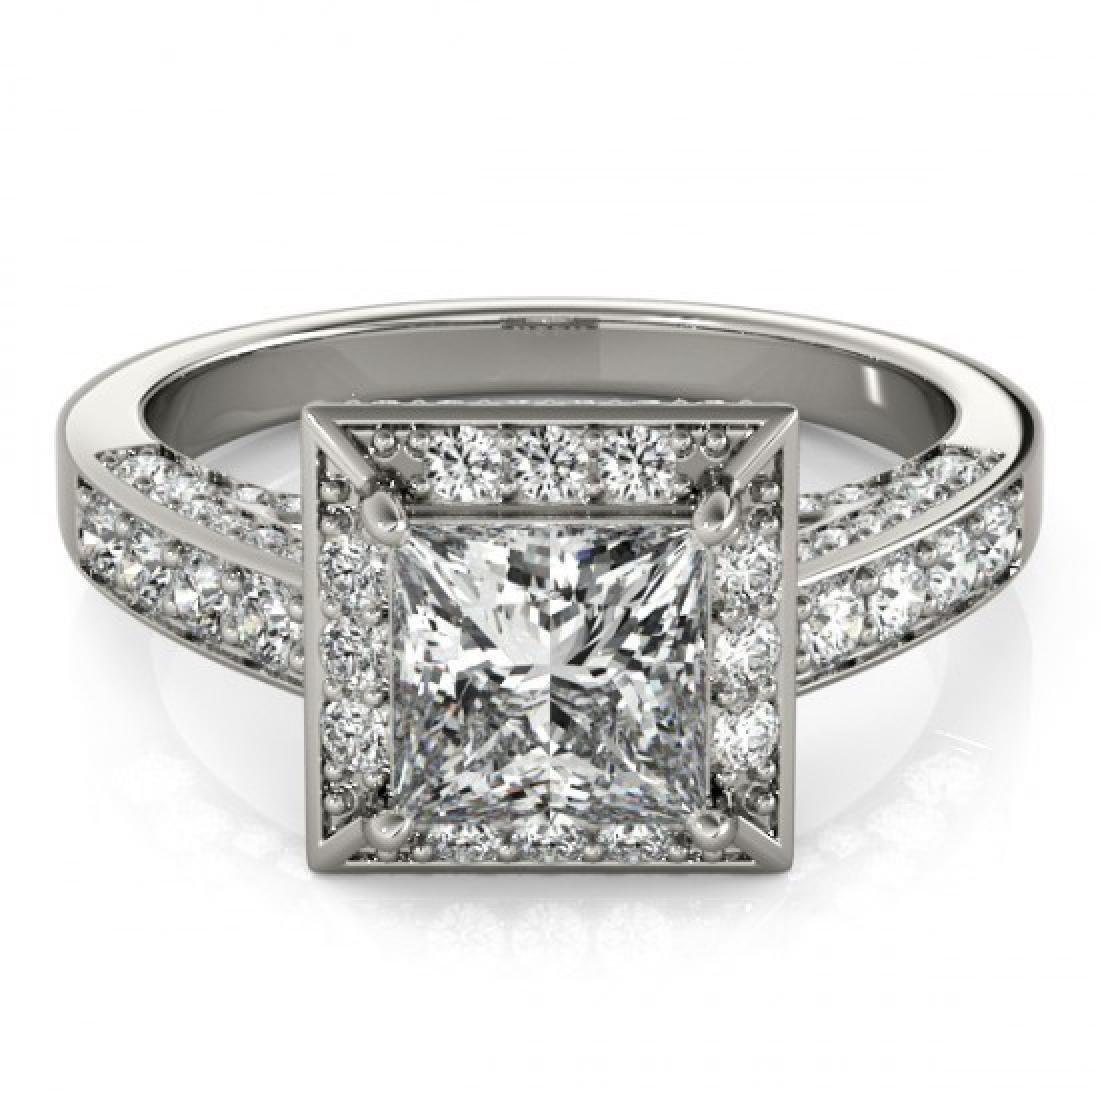 2.1 CTW Certified VS/SI Princess Diamond Solitaire Halo